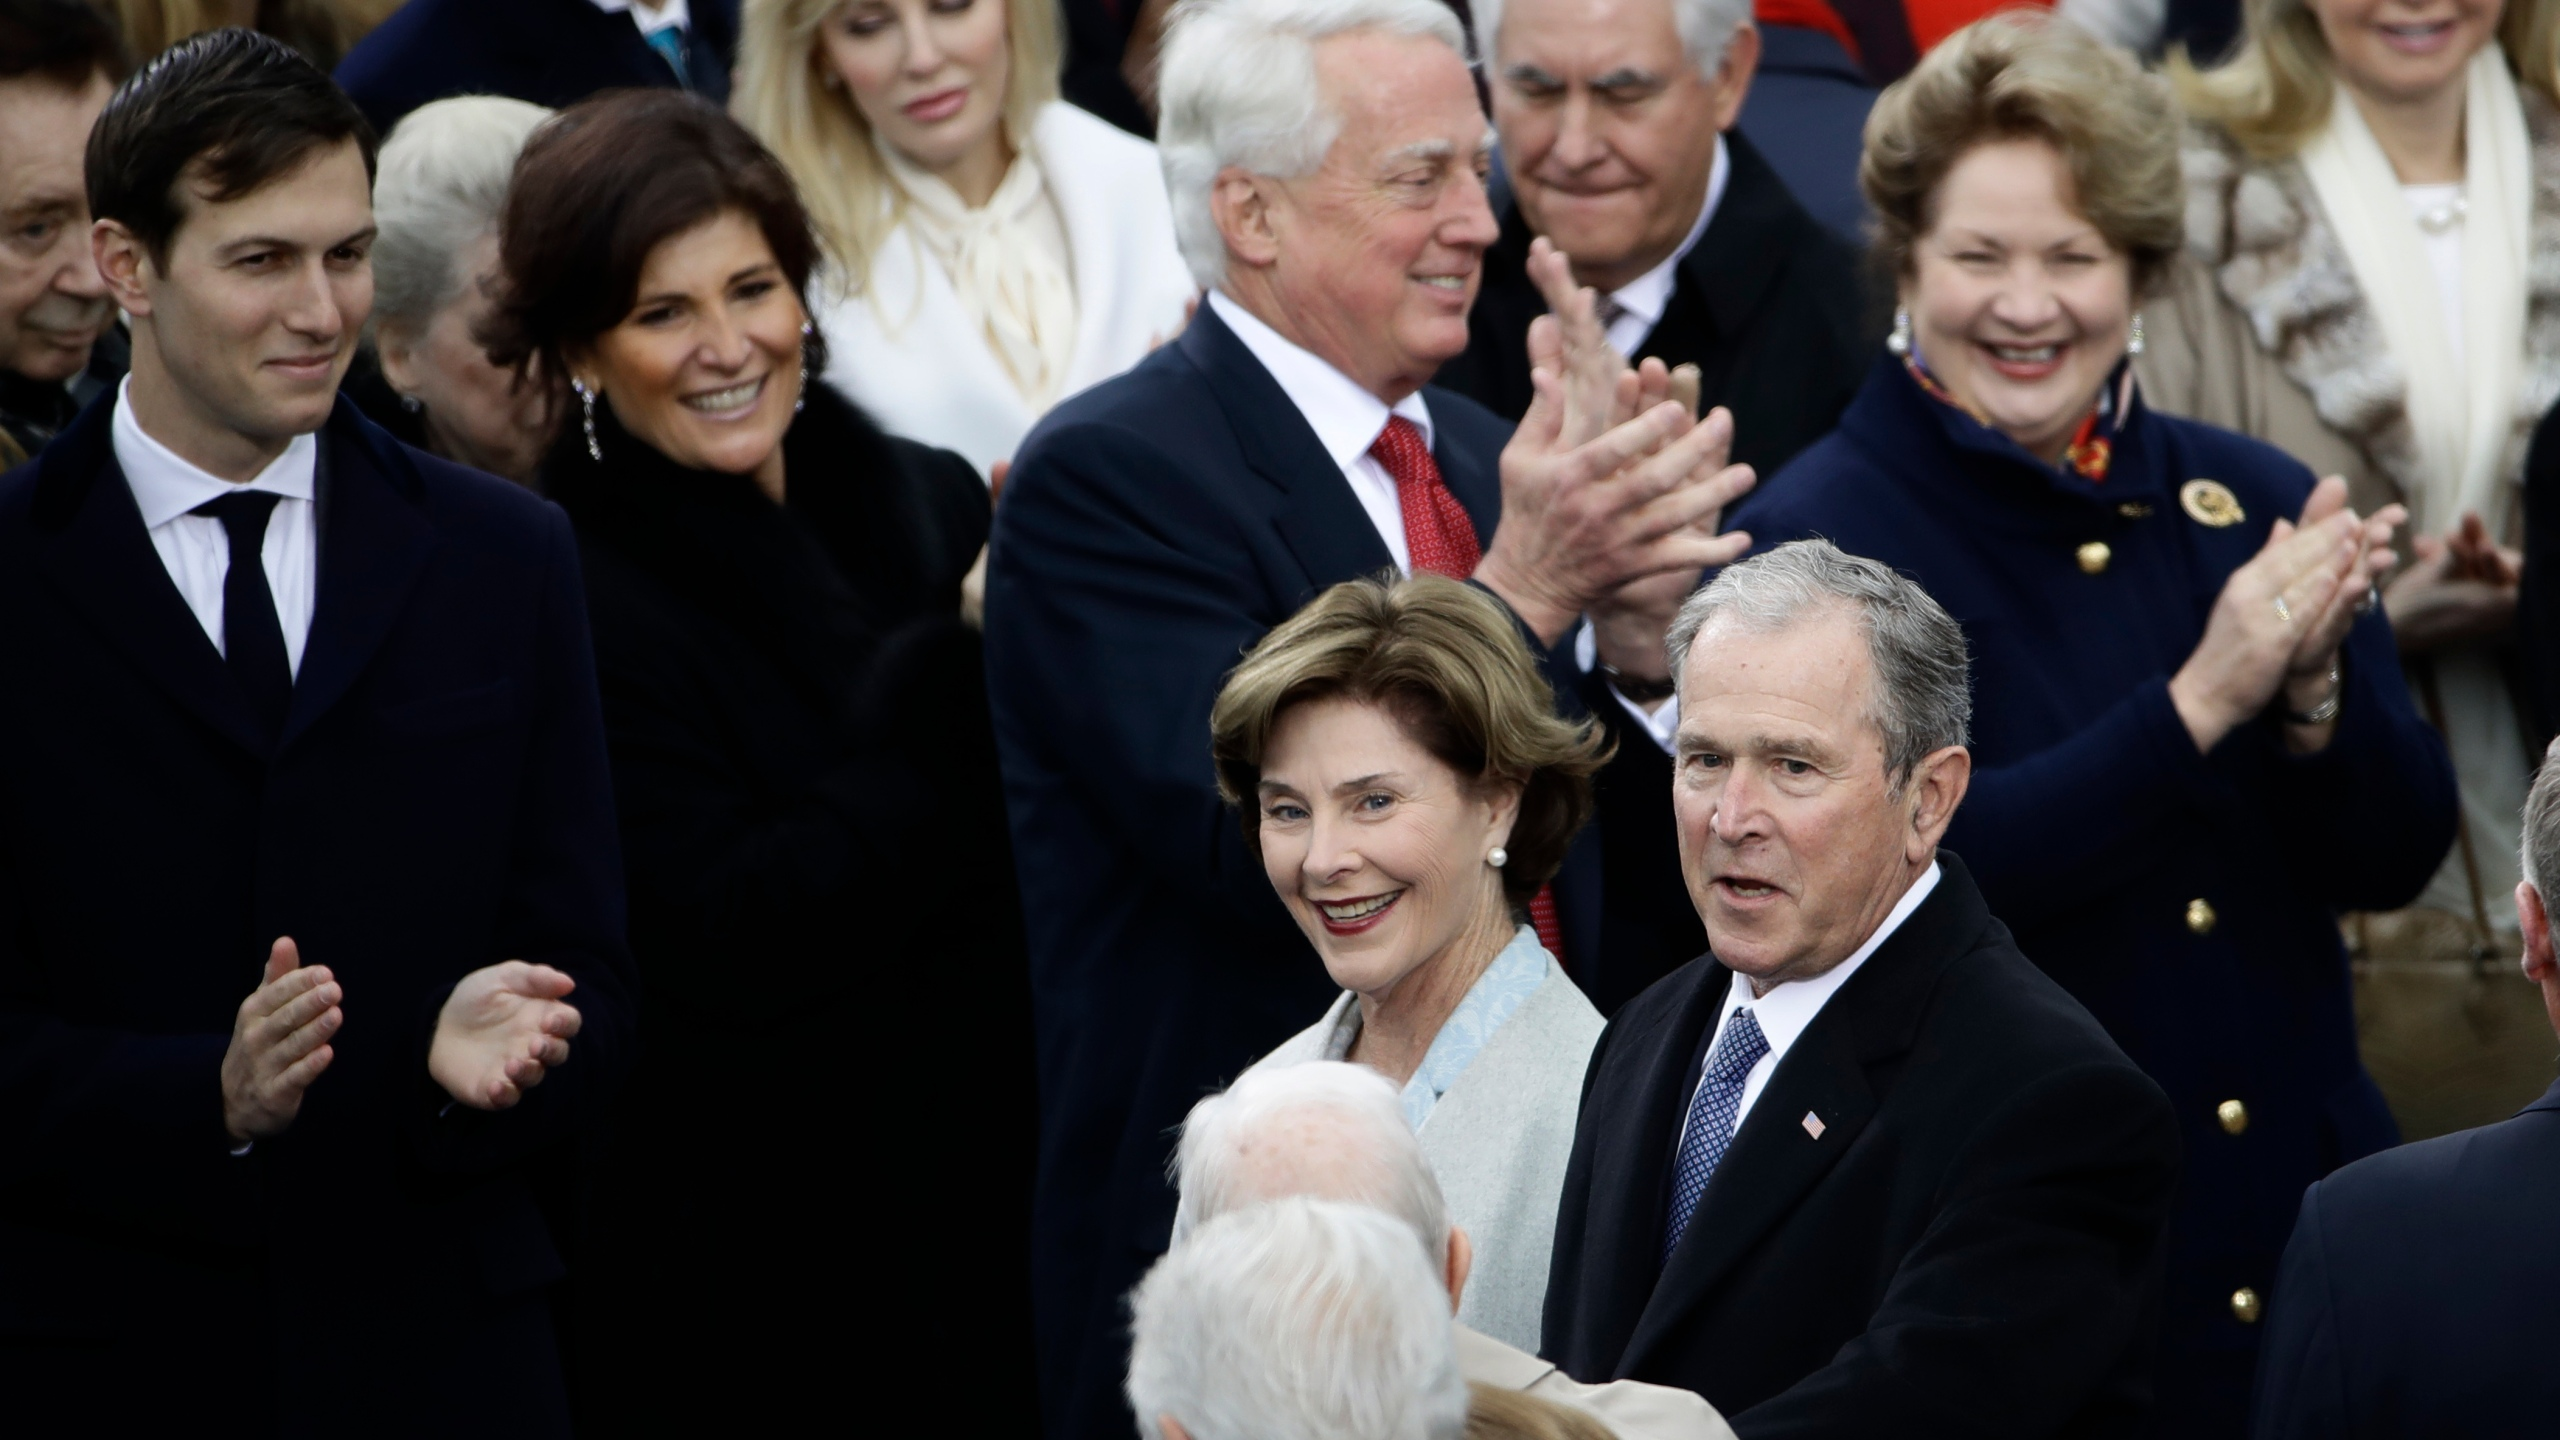 Trump Inauguration Photo by Matt Rourke, AP Photo_289865